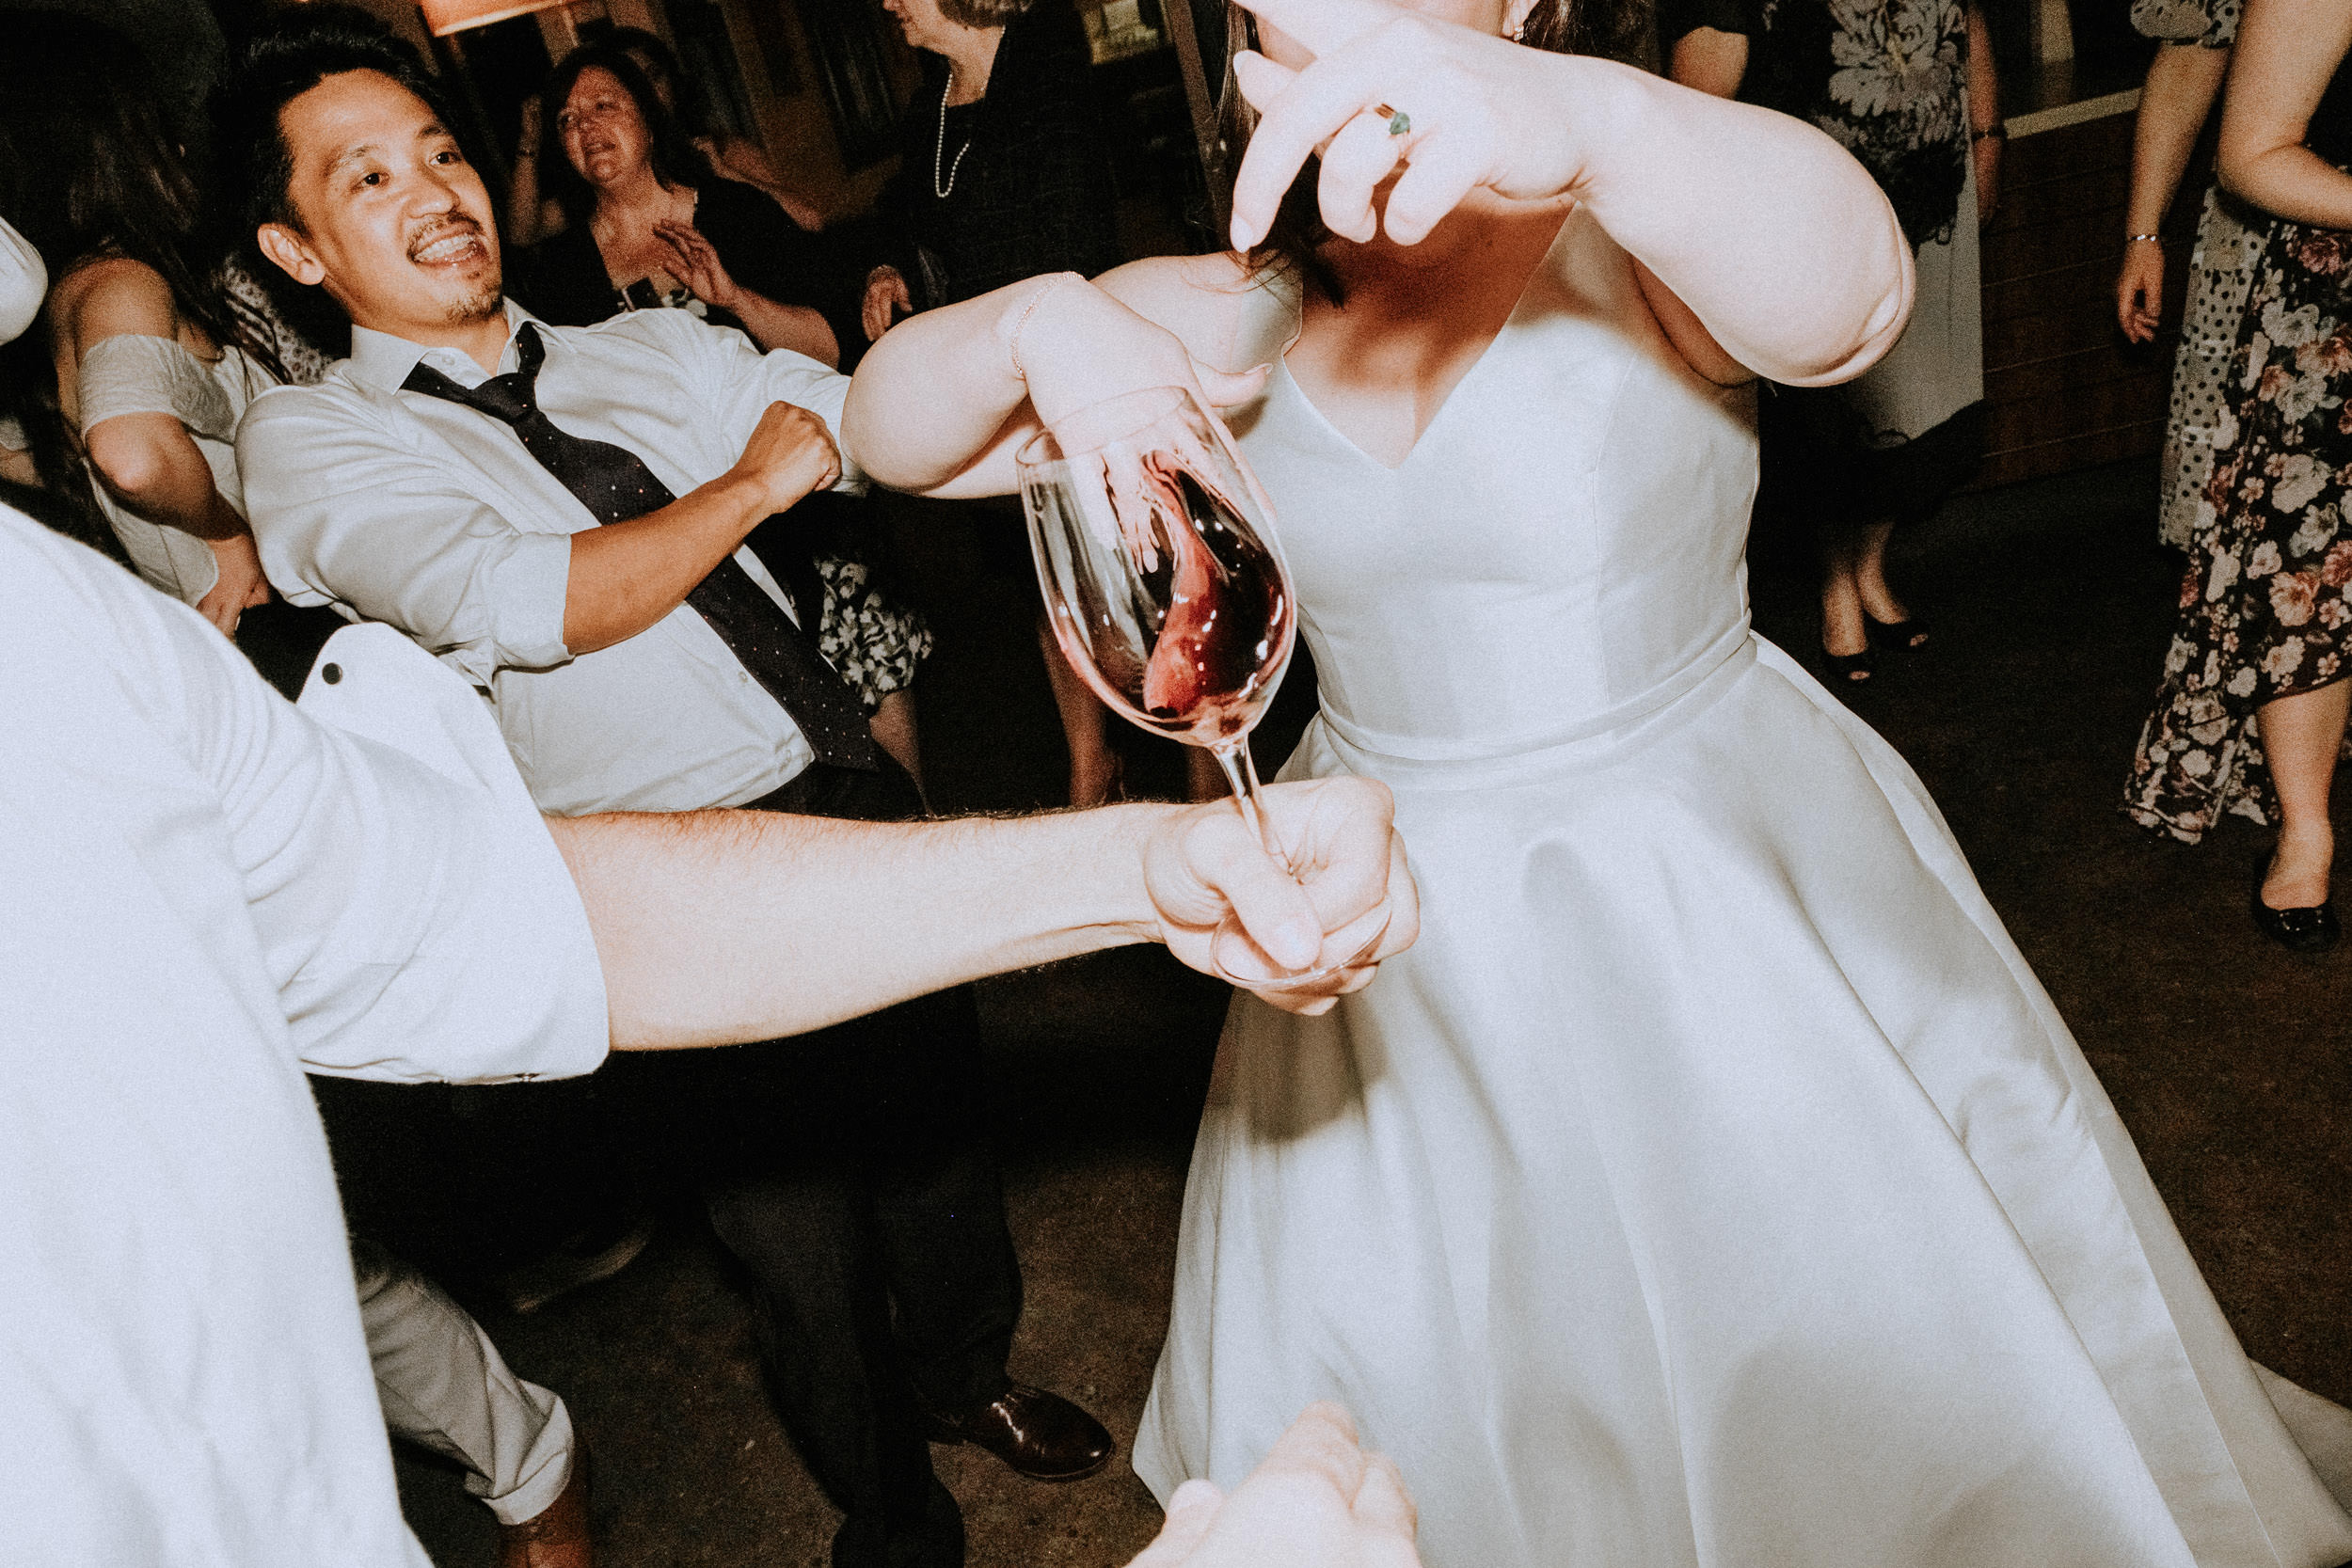 s+j_top_elopement wedding photography_kings & thieves_blog - 597.jpg